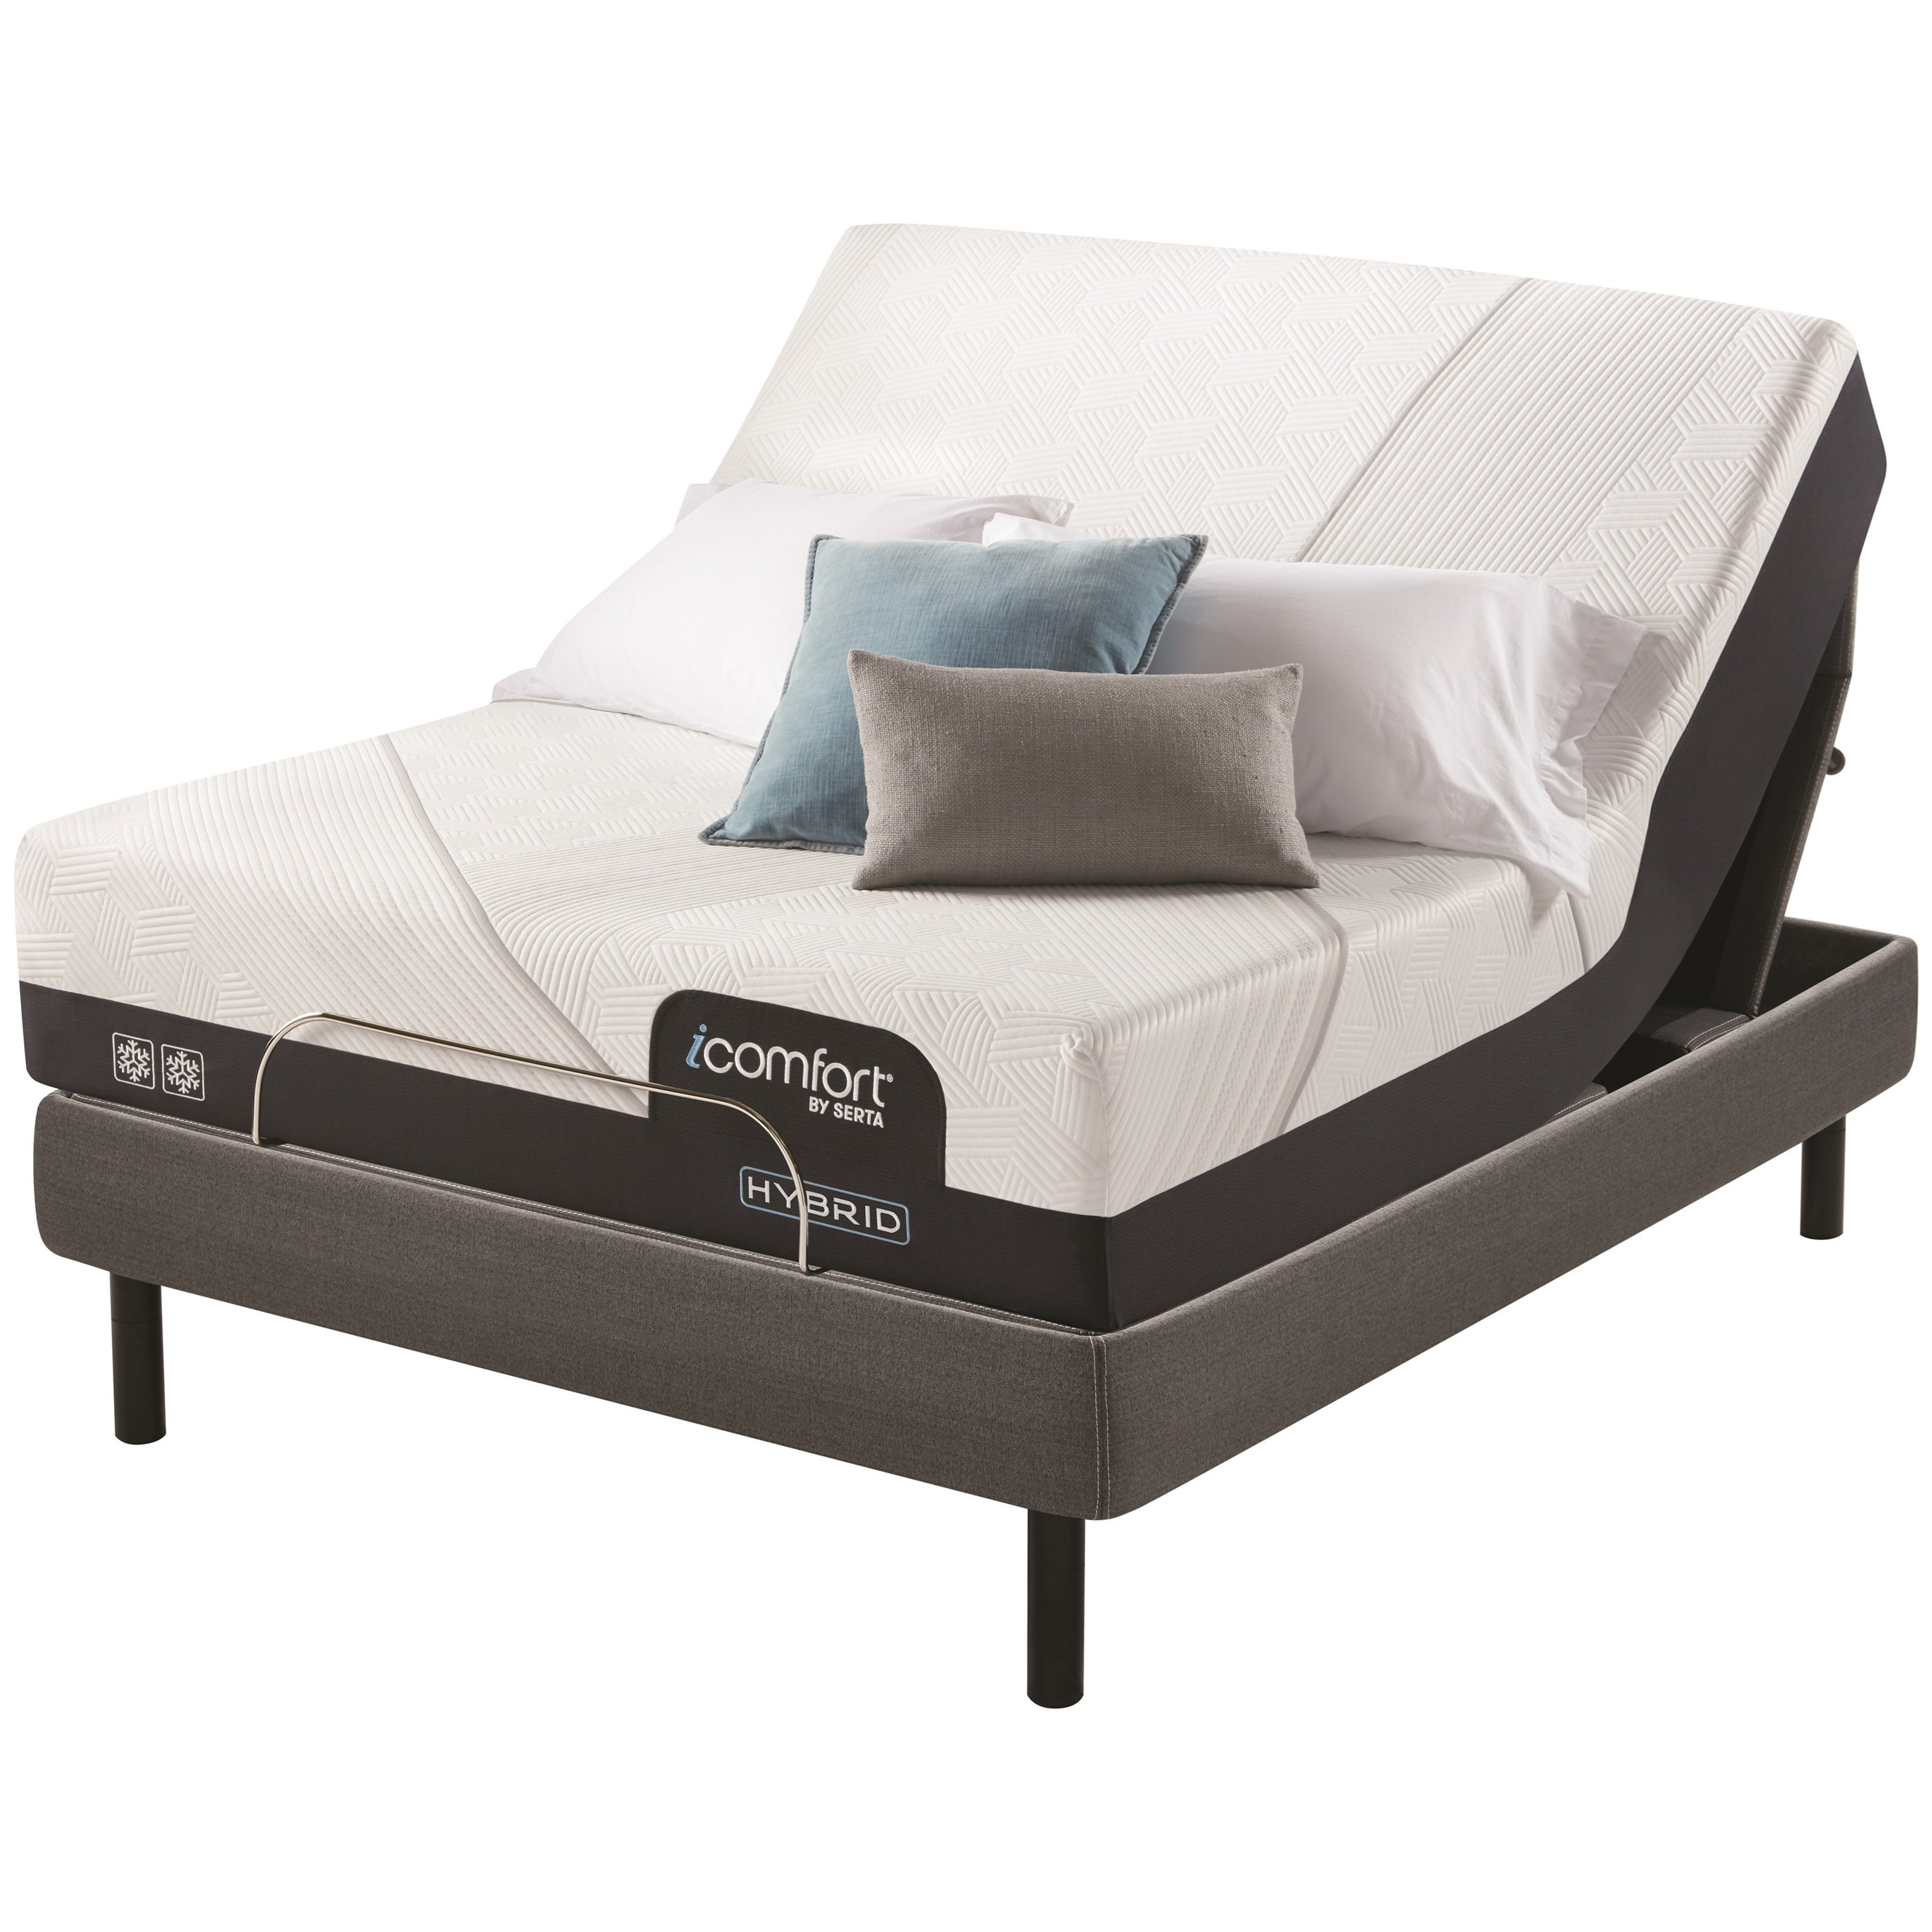 "CF2000 Hybrid Firm King 12 1/2"" Firm Hybrid Adj Set by Serta at Miller Waldrop Furniture and Decor"